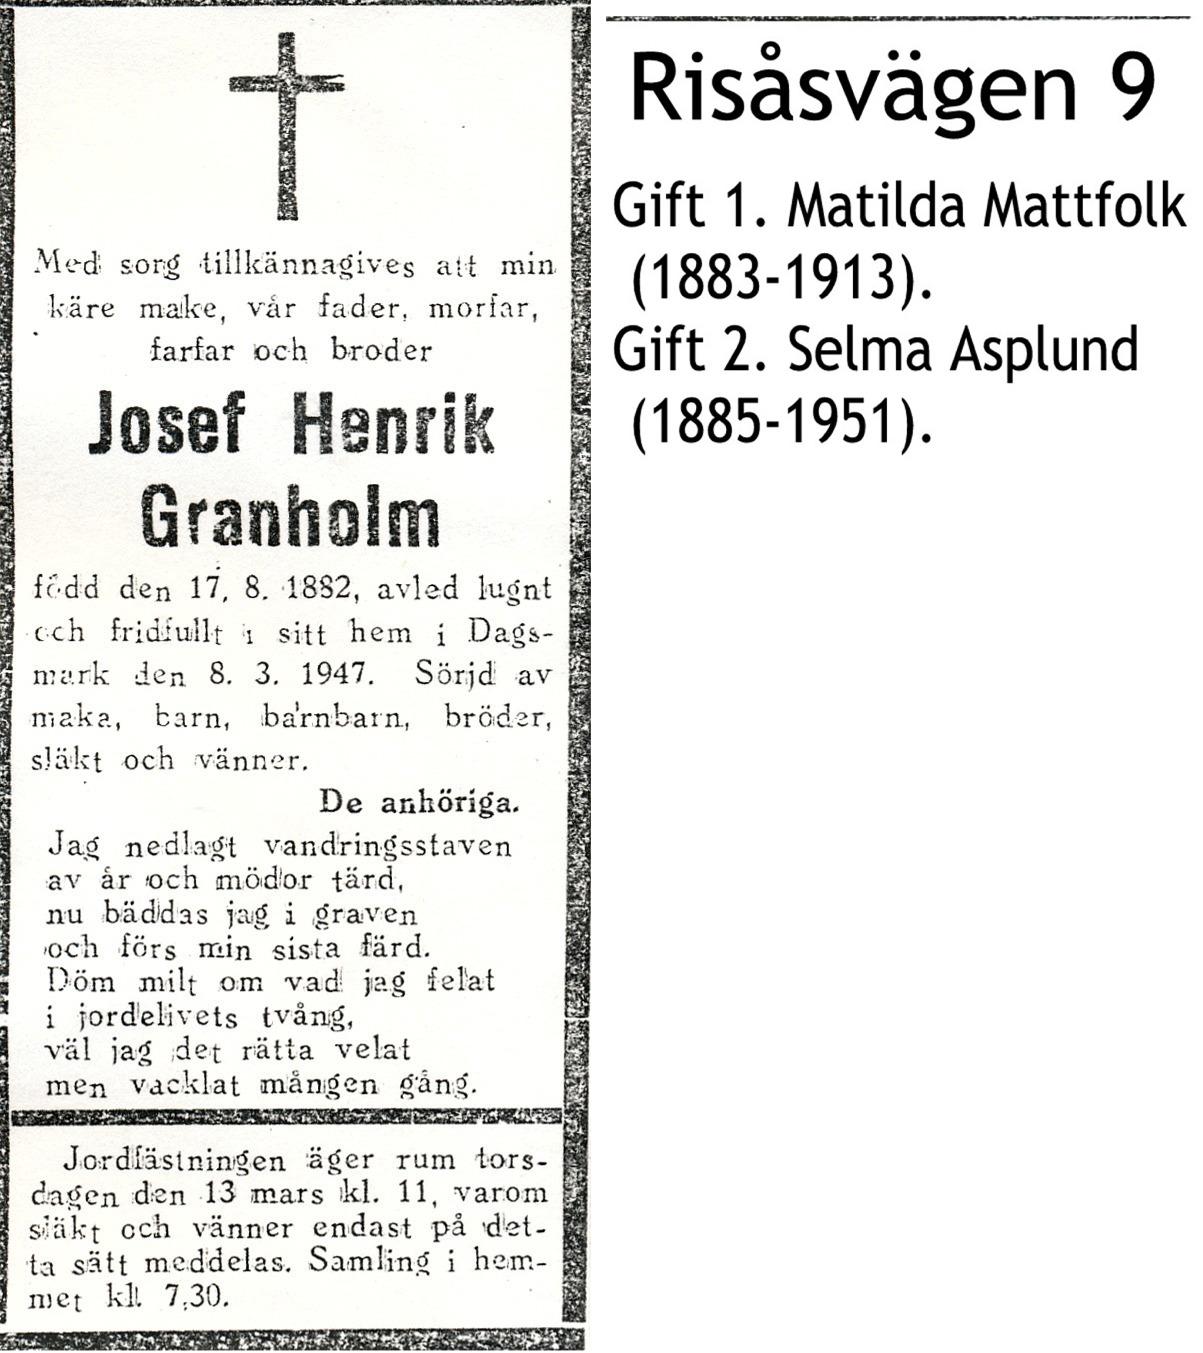 Granholm Josef Henrik